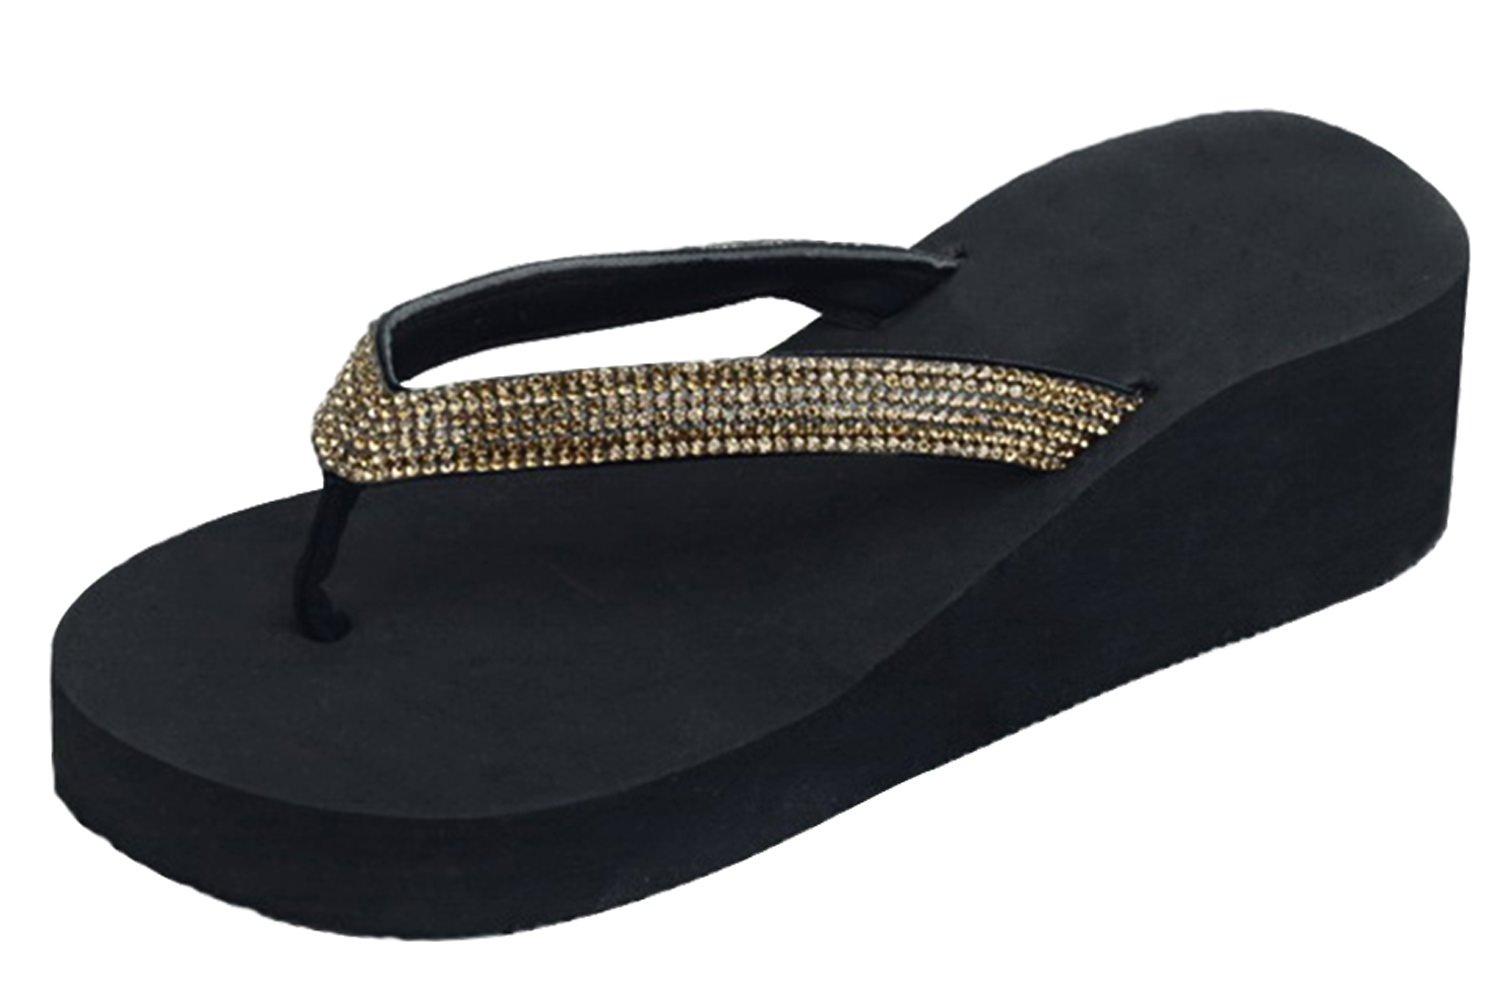 Top Arla Gold Platform Wedge Women Sandal New Prime Pretty Rhinestone Bling Open Heel Bedazzled Designer Pool Summer Slip On Slipper for Sale Teen Girl Ladies (Size 10, Gold)